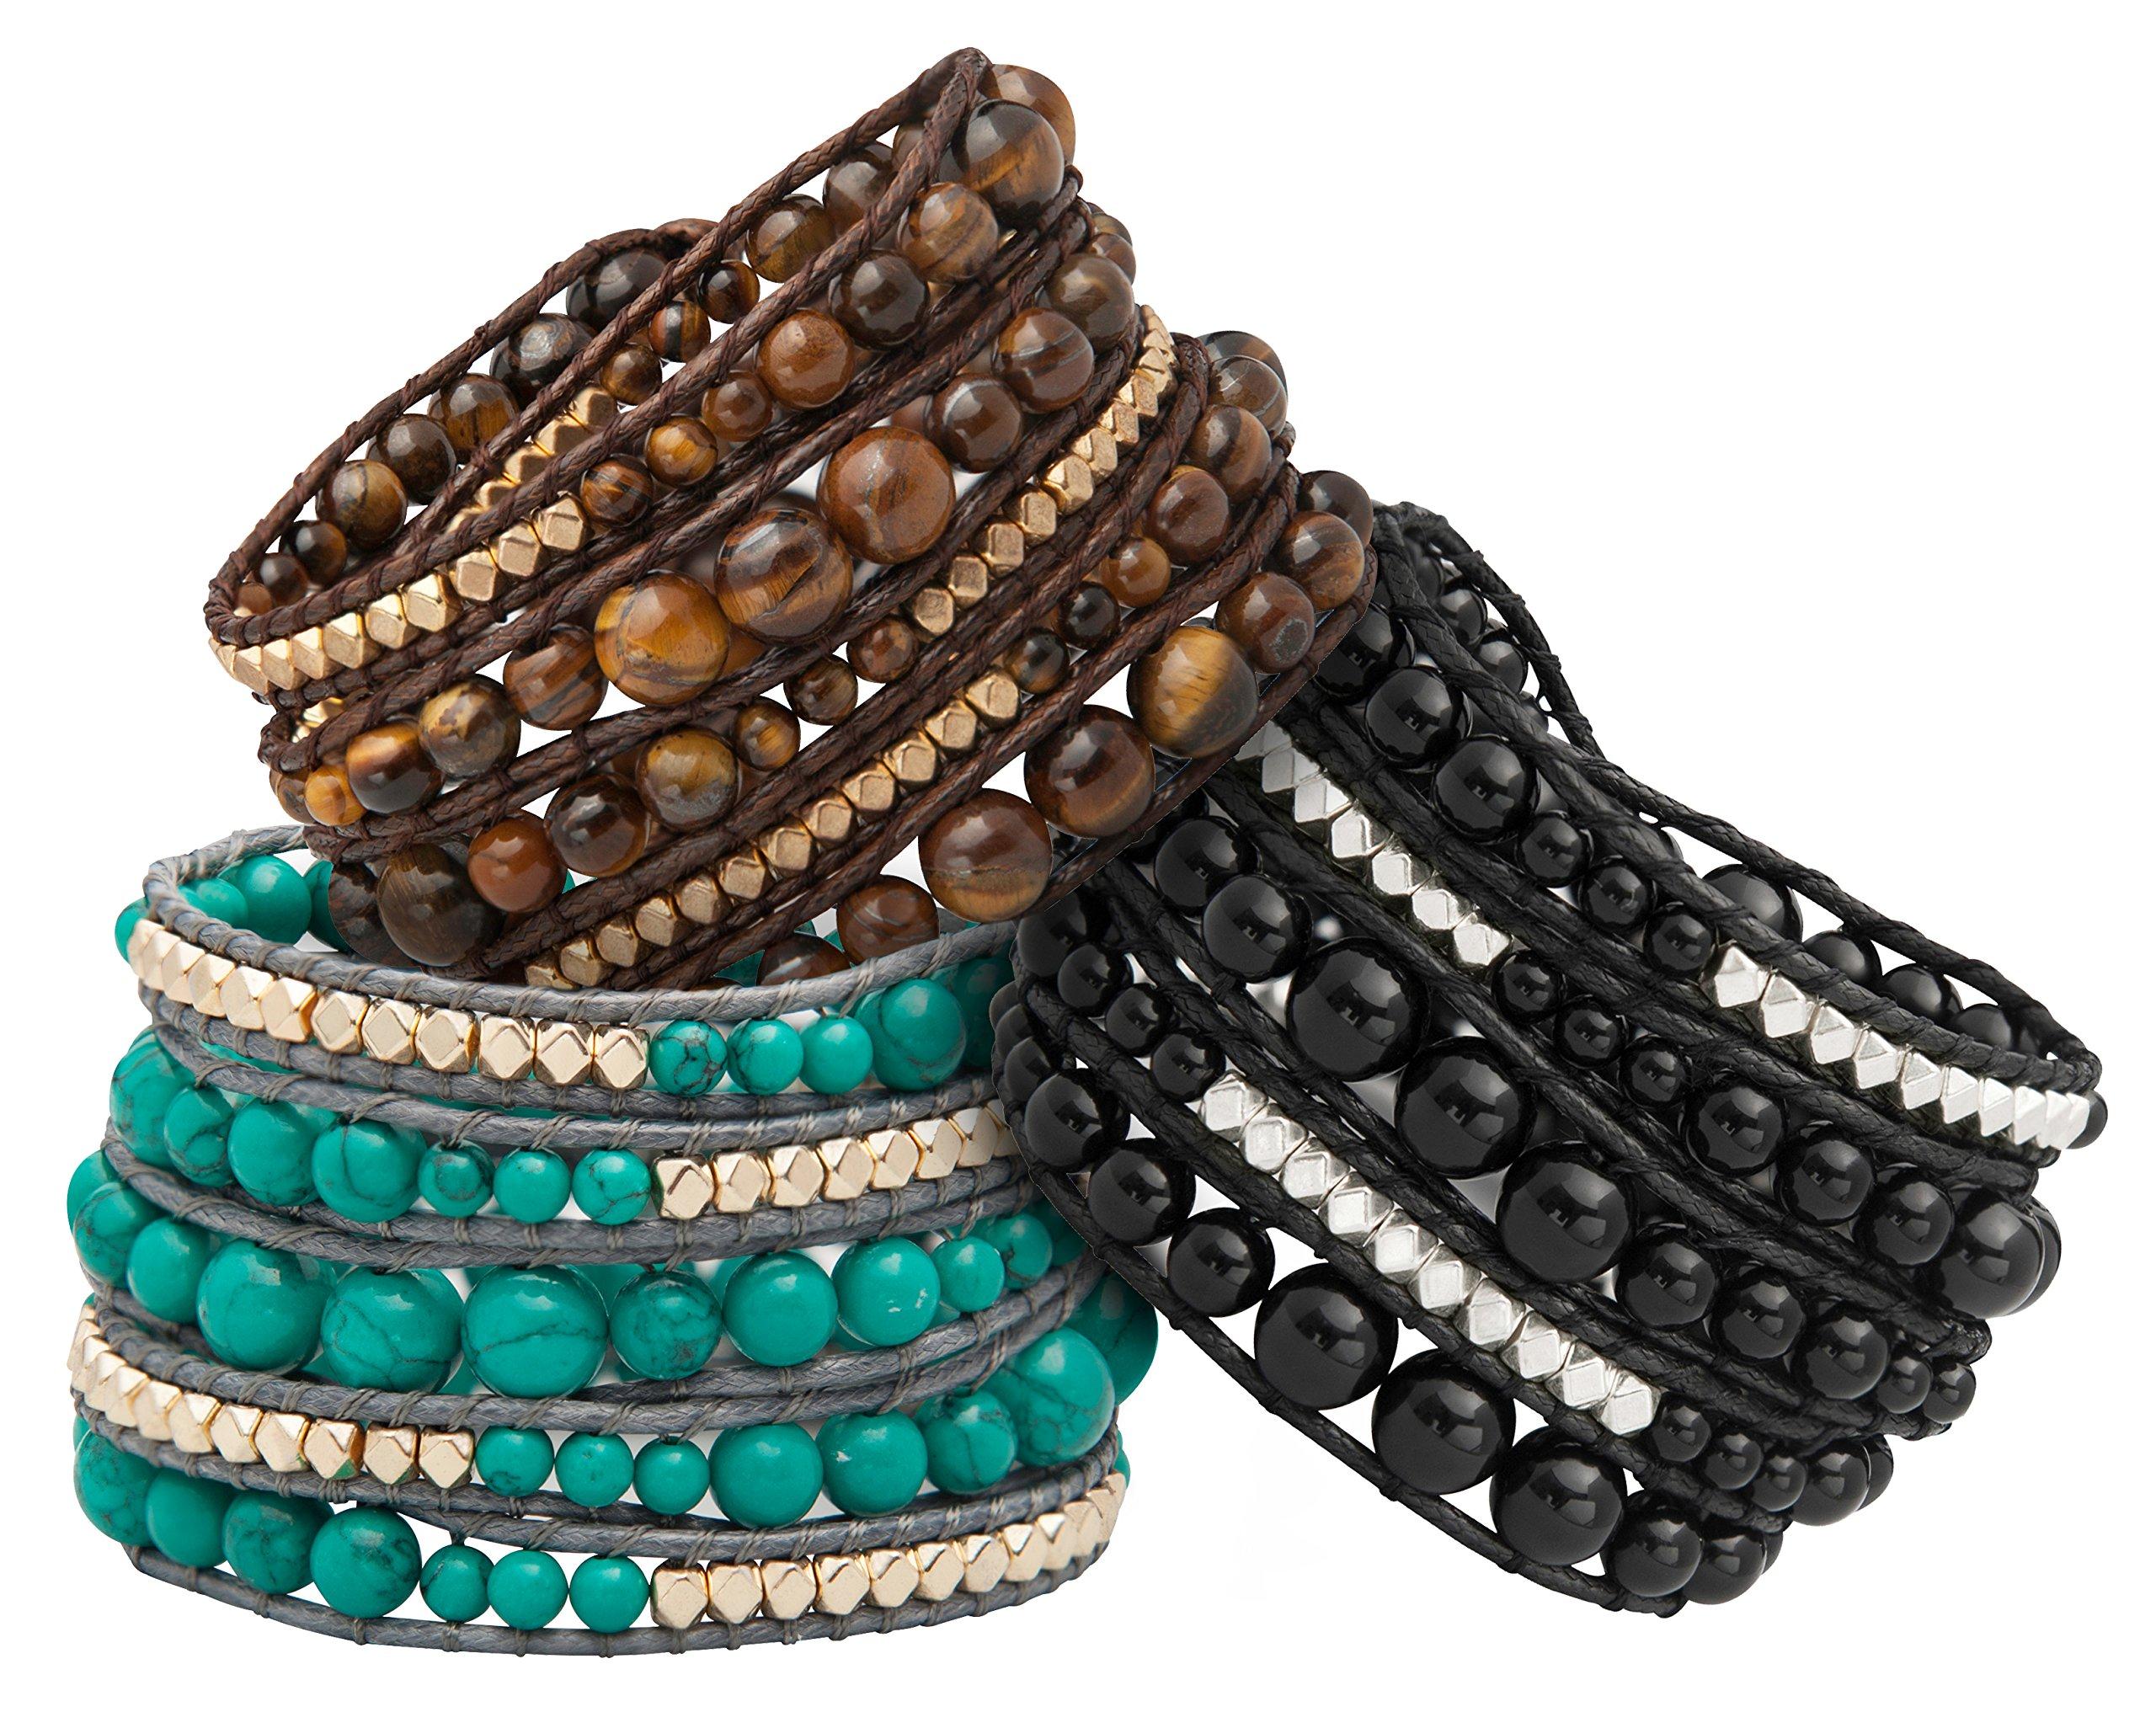 Genuine Stones 5 Wrap Bracelet - Bangle Cuff Rope With Beads - Unisex - Free Size Adjustable (Turquoise) by Sun Life Style (Image #6)